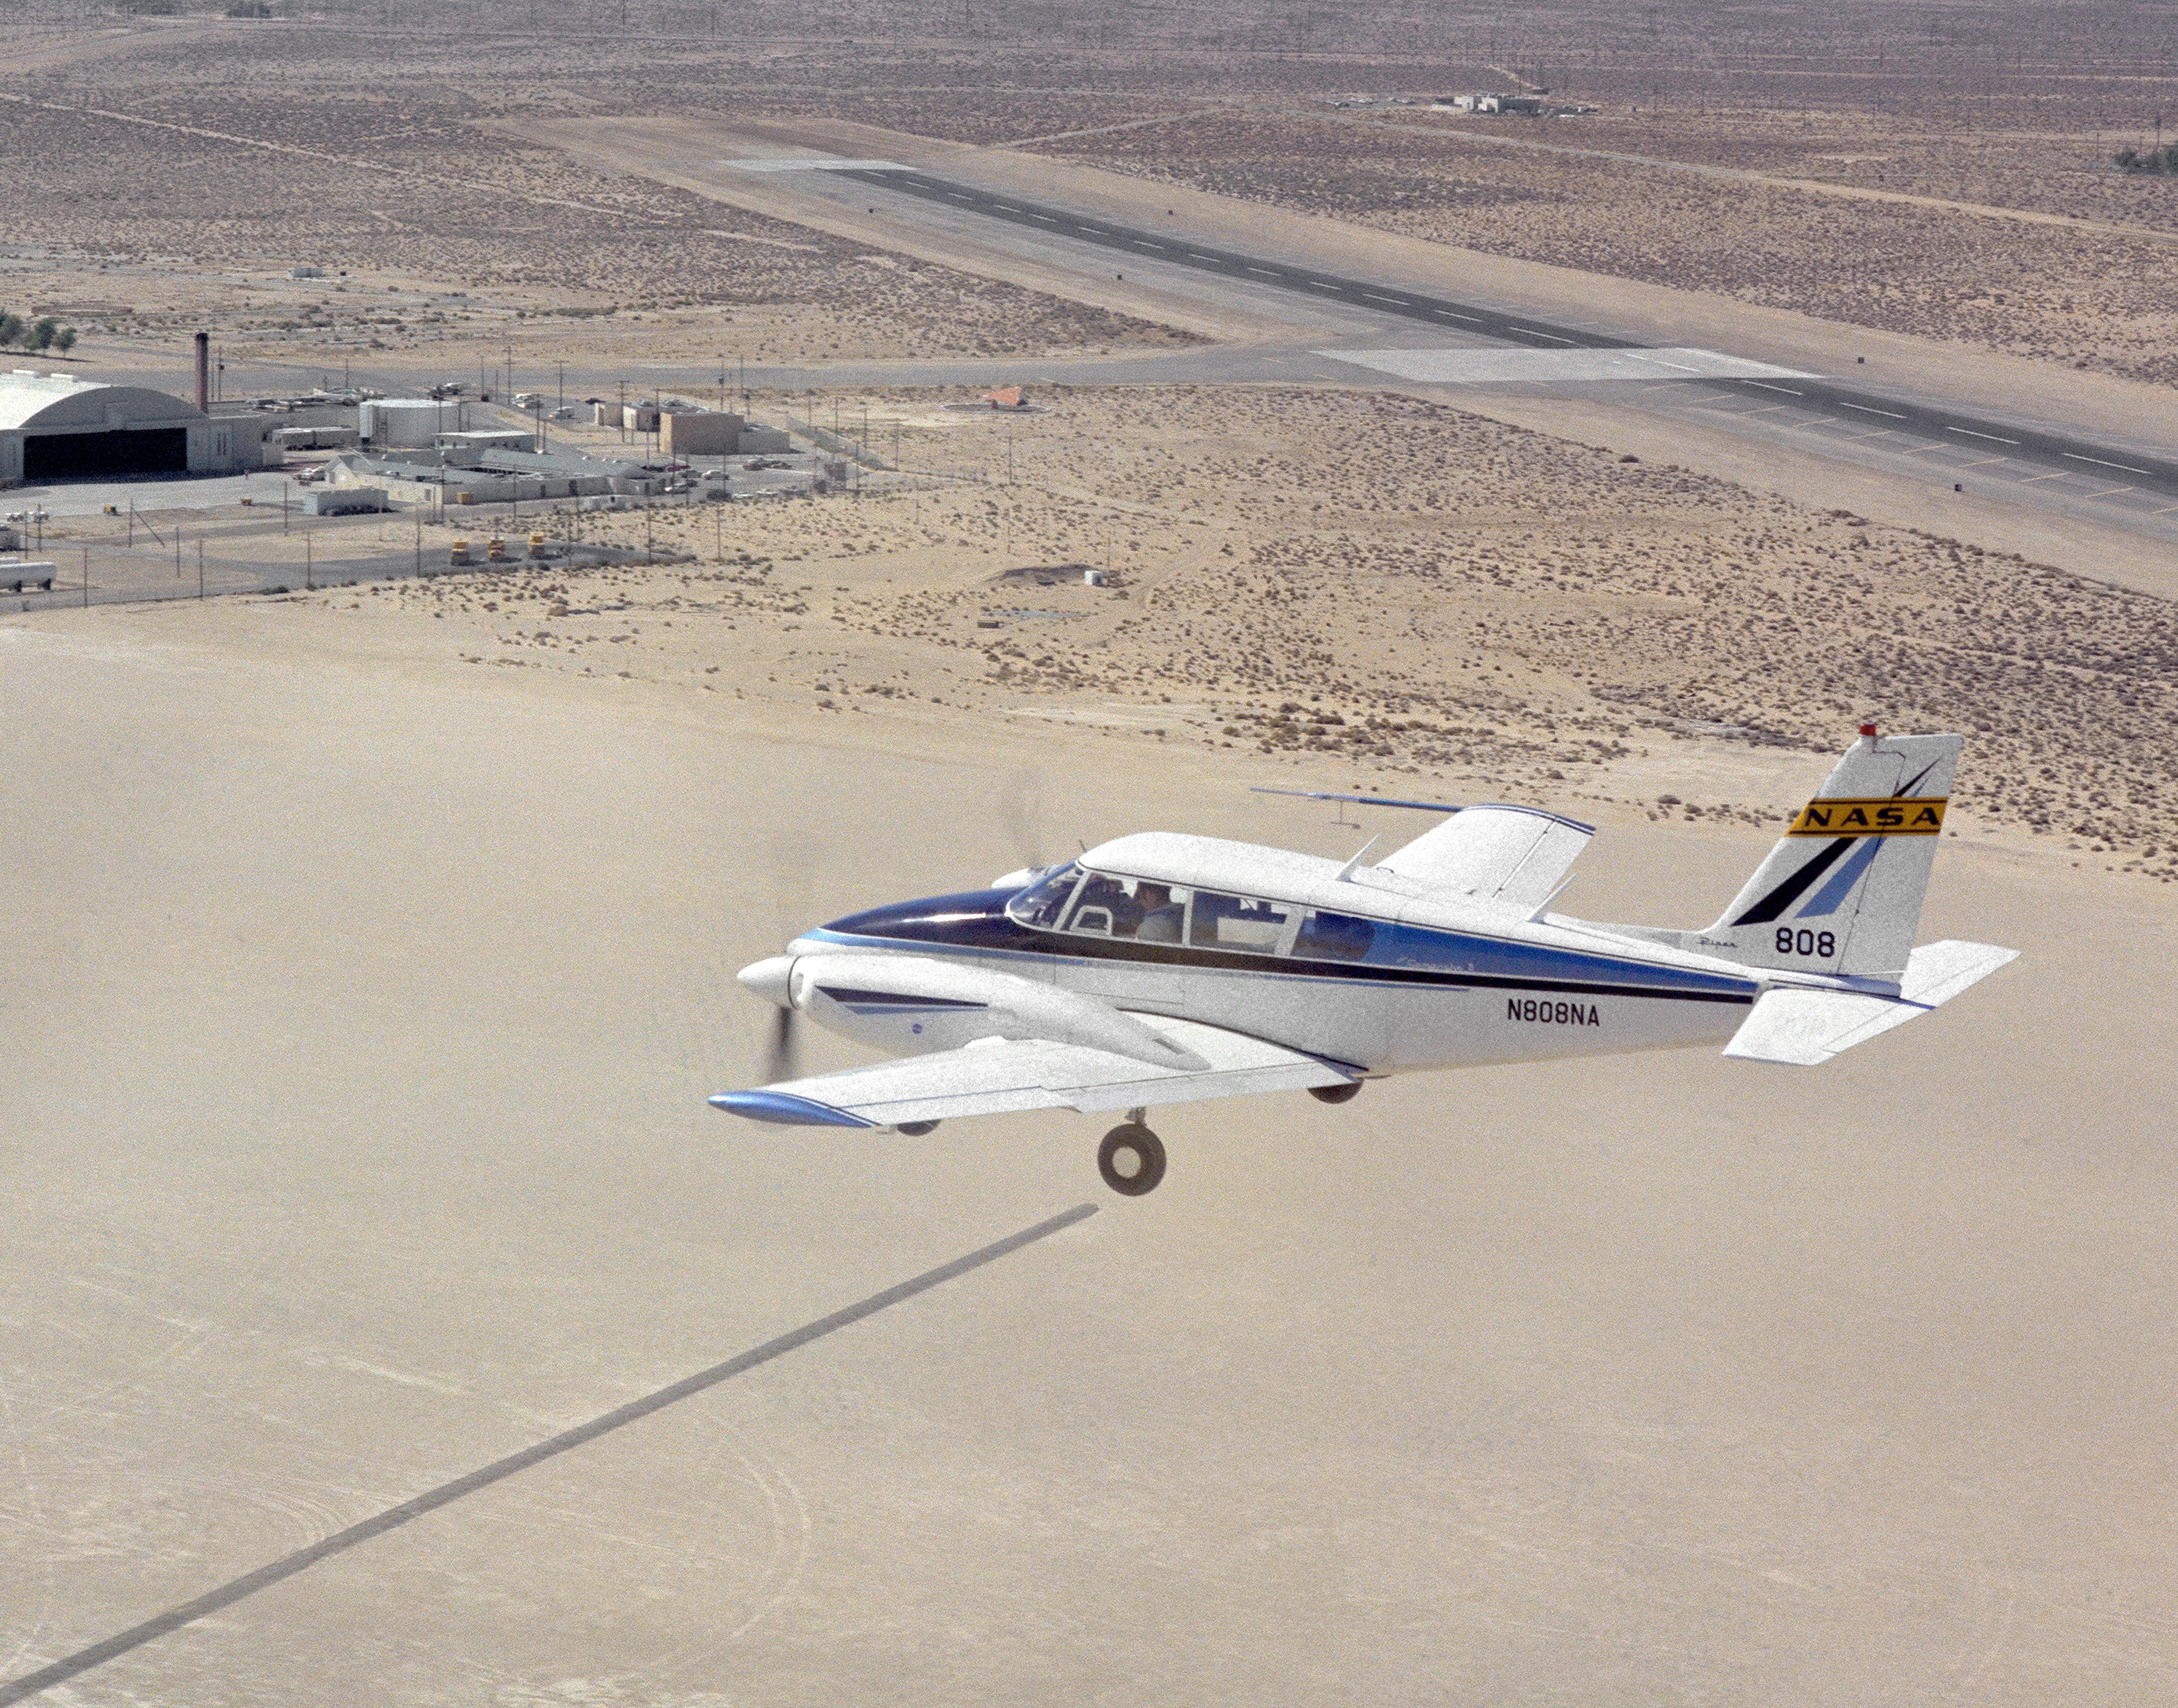 pa 30 twin comanche nasa 808 in flight nasa image and video